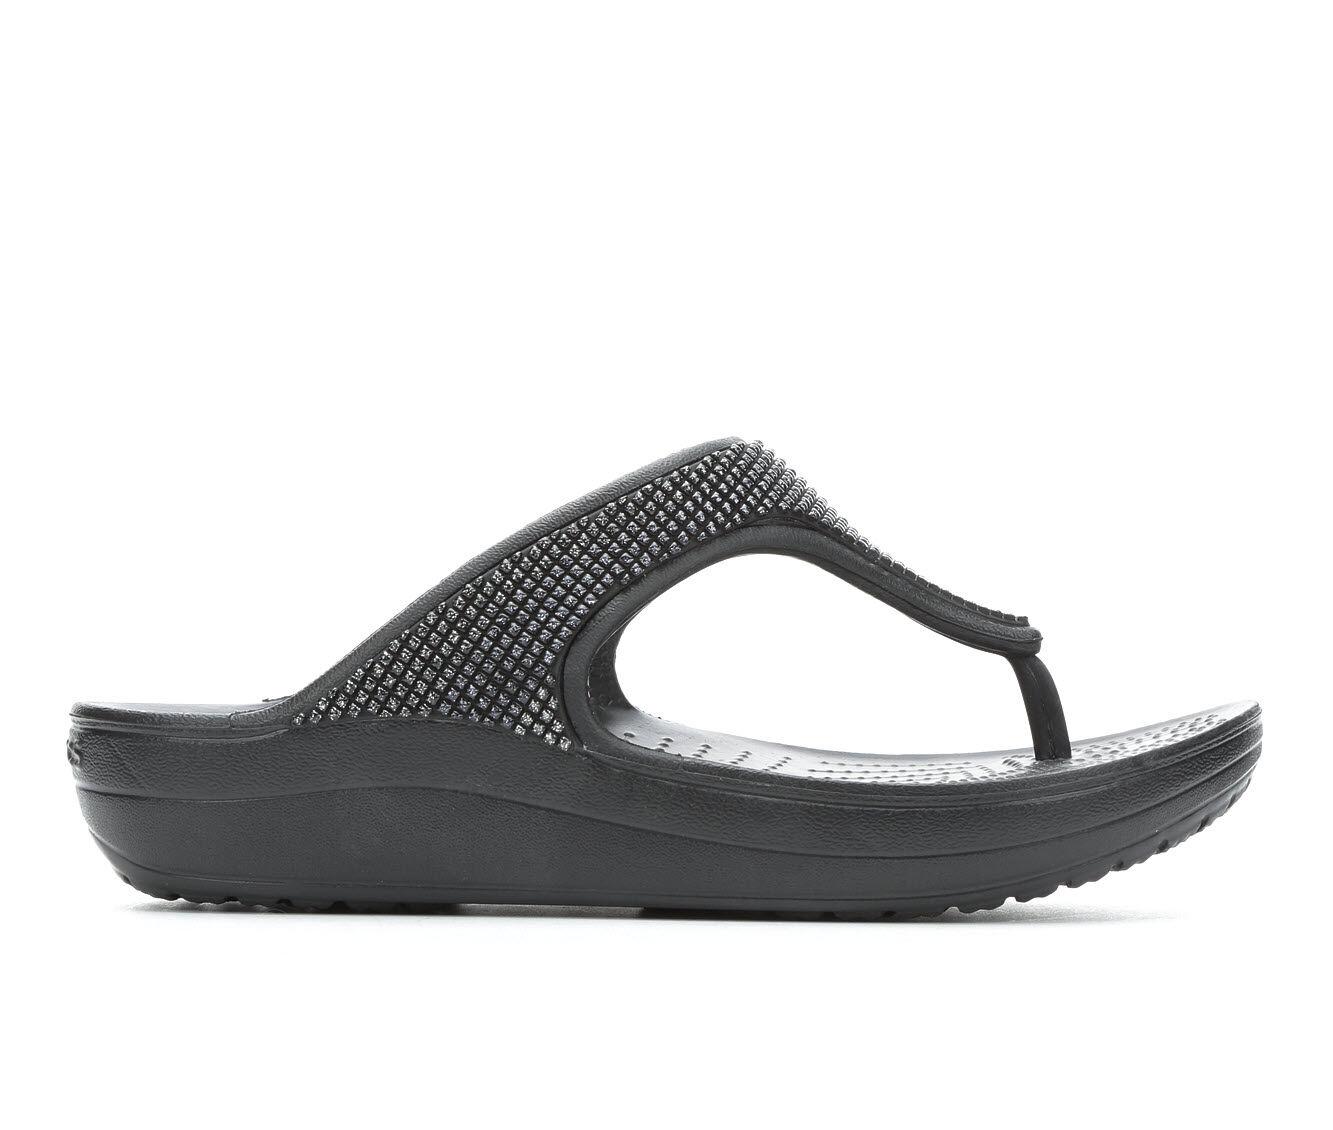 Satisfying Women's Crocs Sloane Ombre Black/Ombre